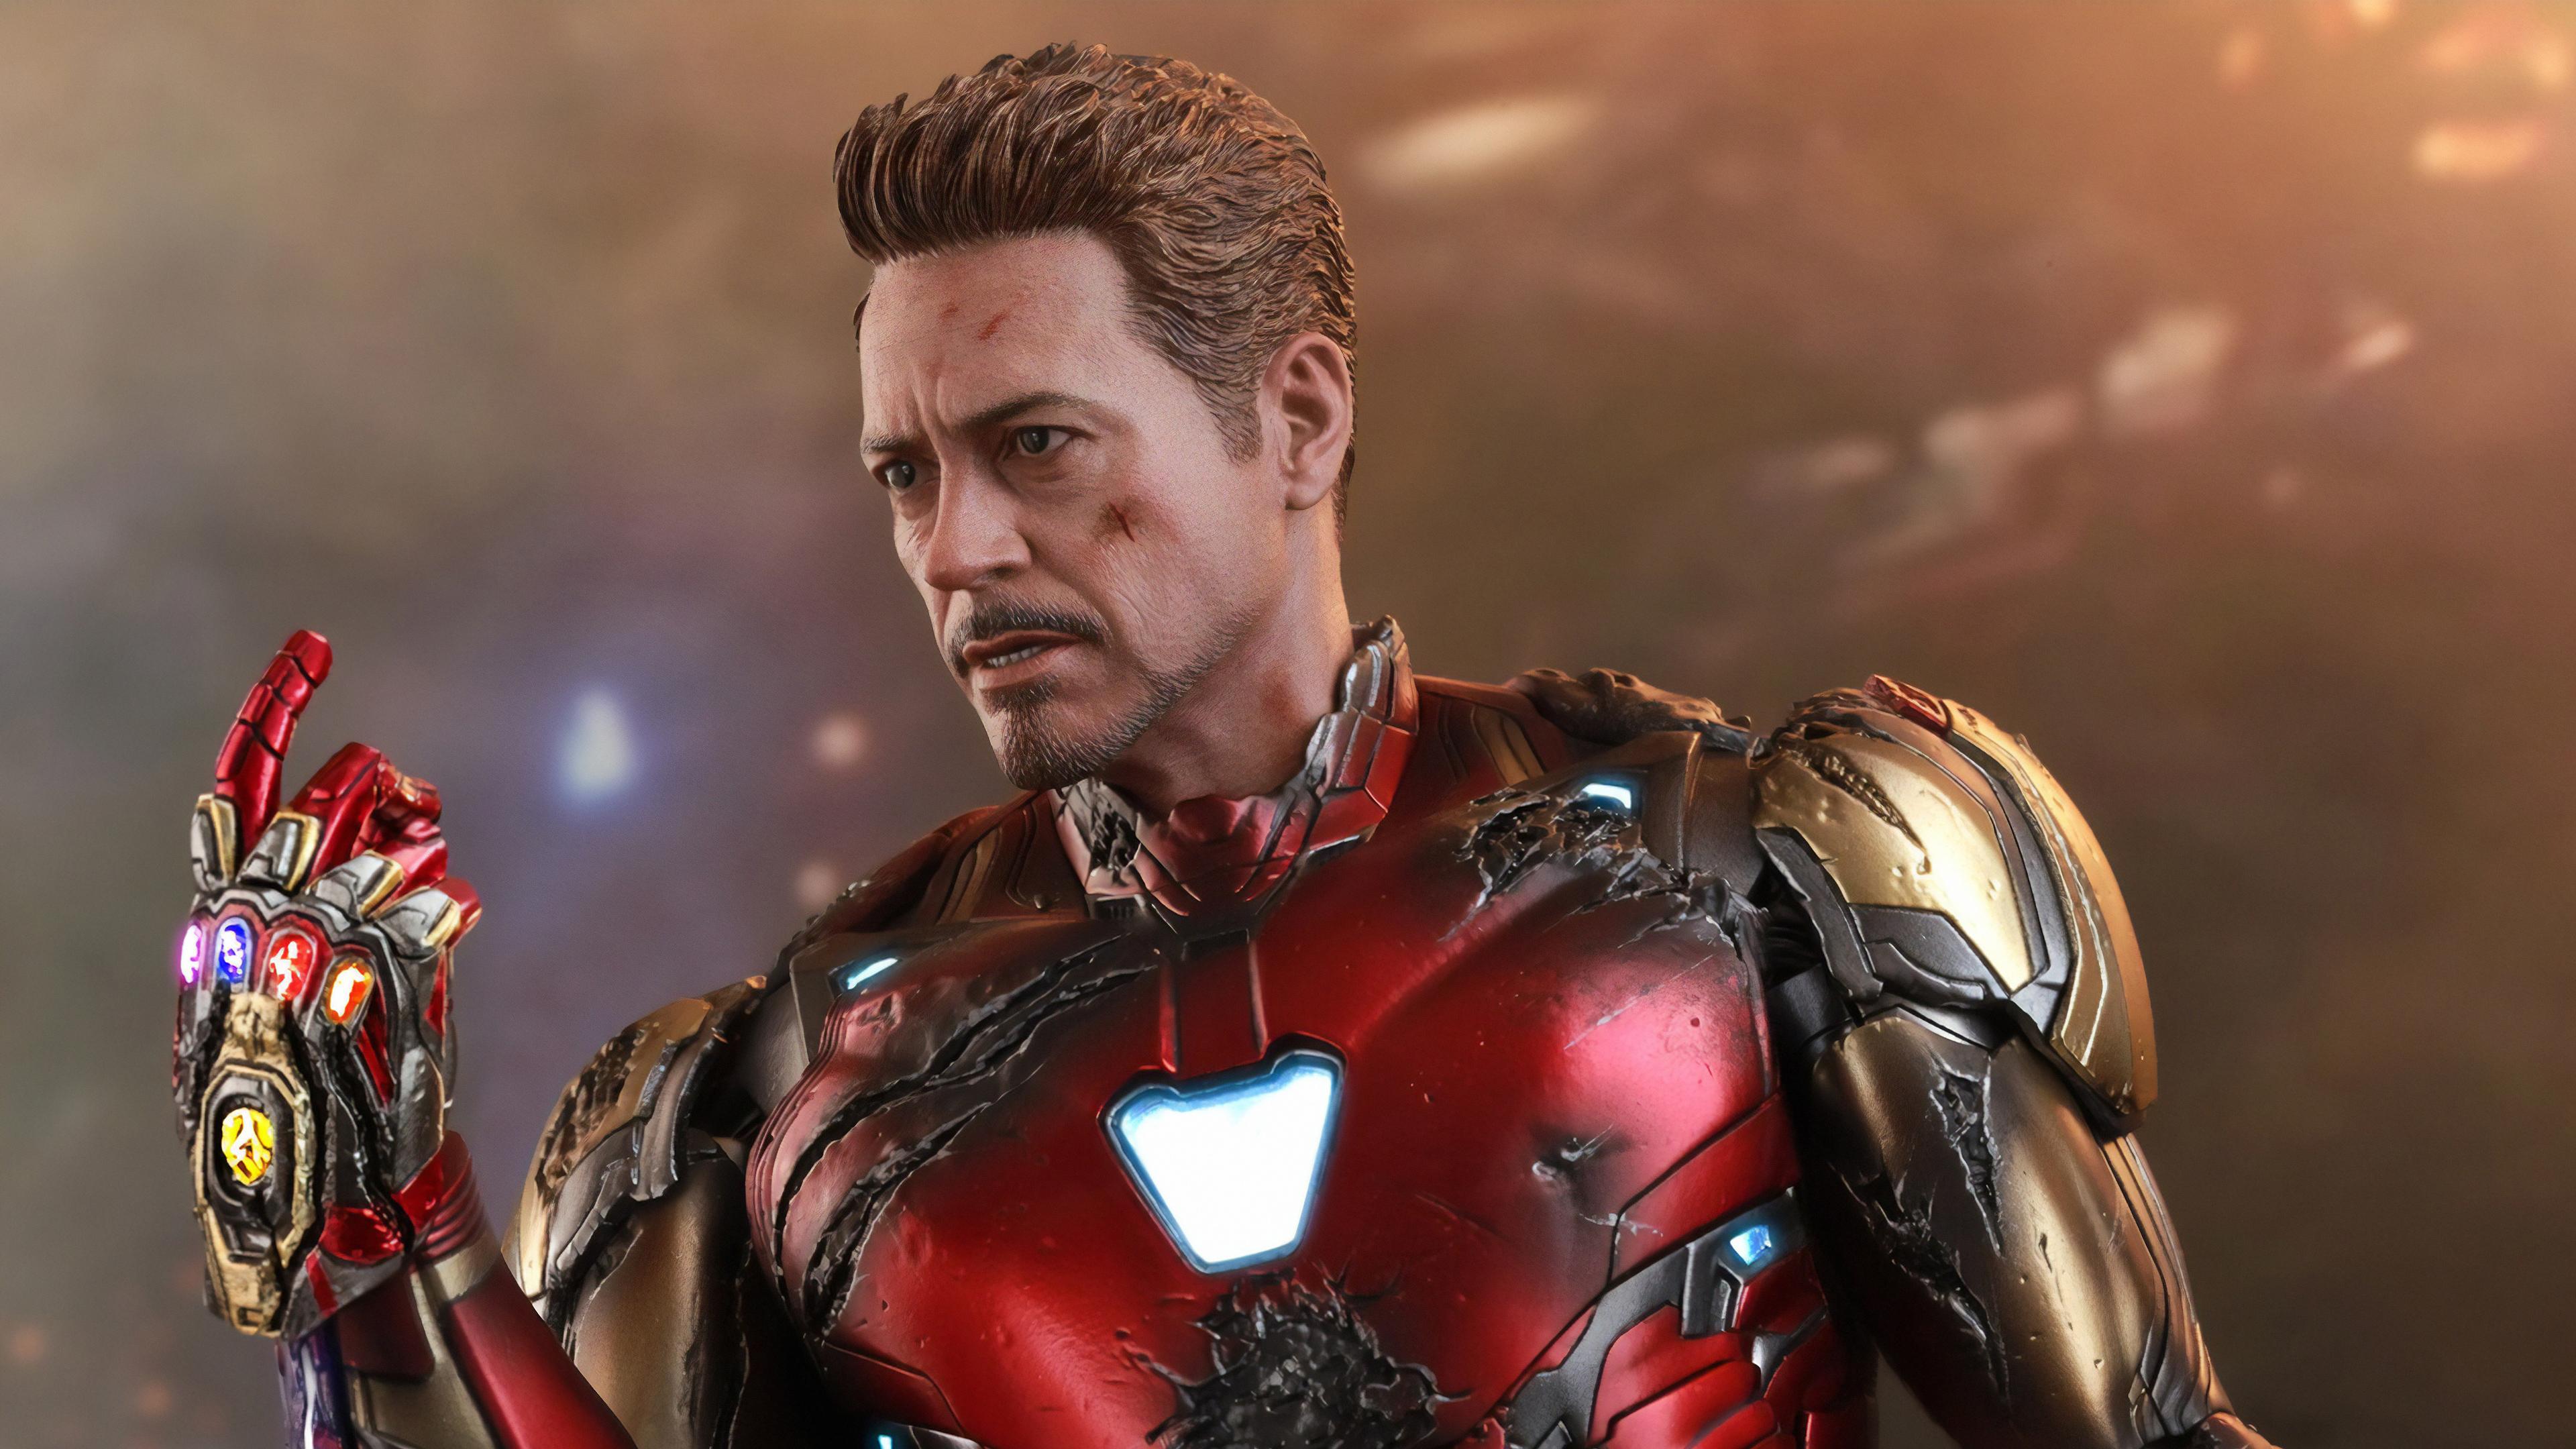 iron man infinity gauntlet 2019 1565052864 - Iron Man Infinity Gauntlet 2019 - superheroes wallpapers, iron man wallpapers, hd-wallpapers, digital art wallpapers, artwork wallpapers, 4k-wallpapers